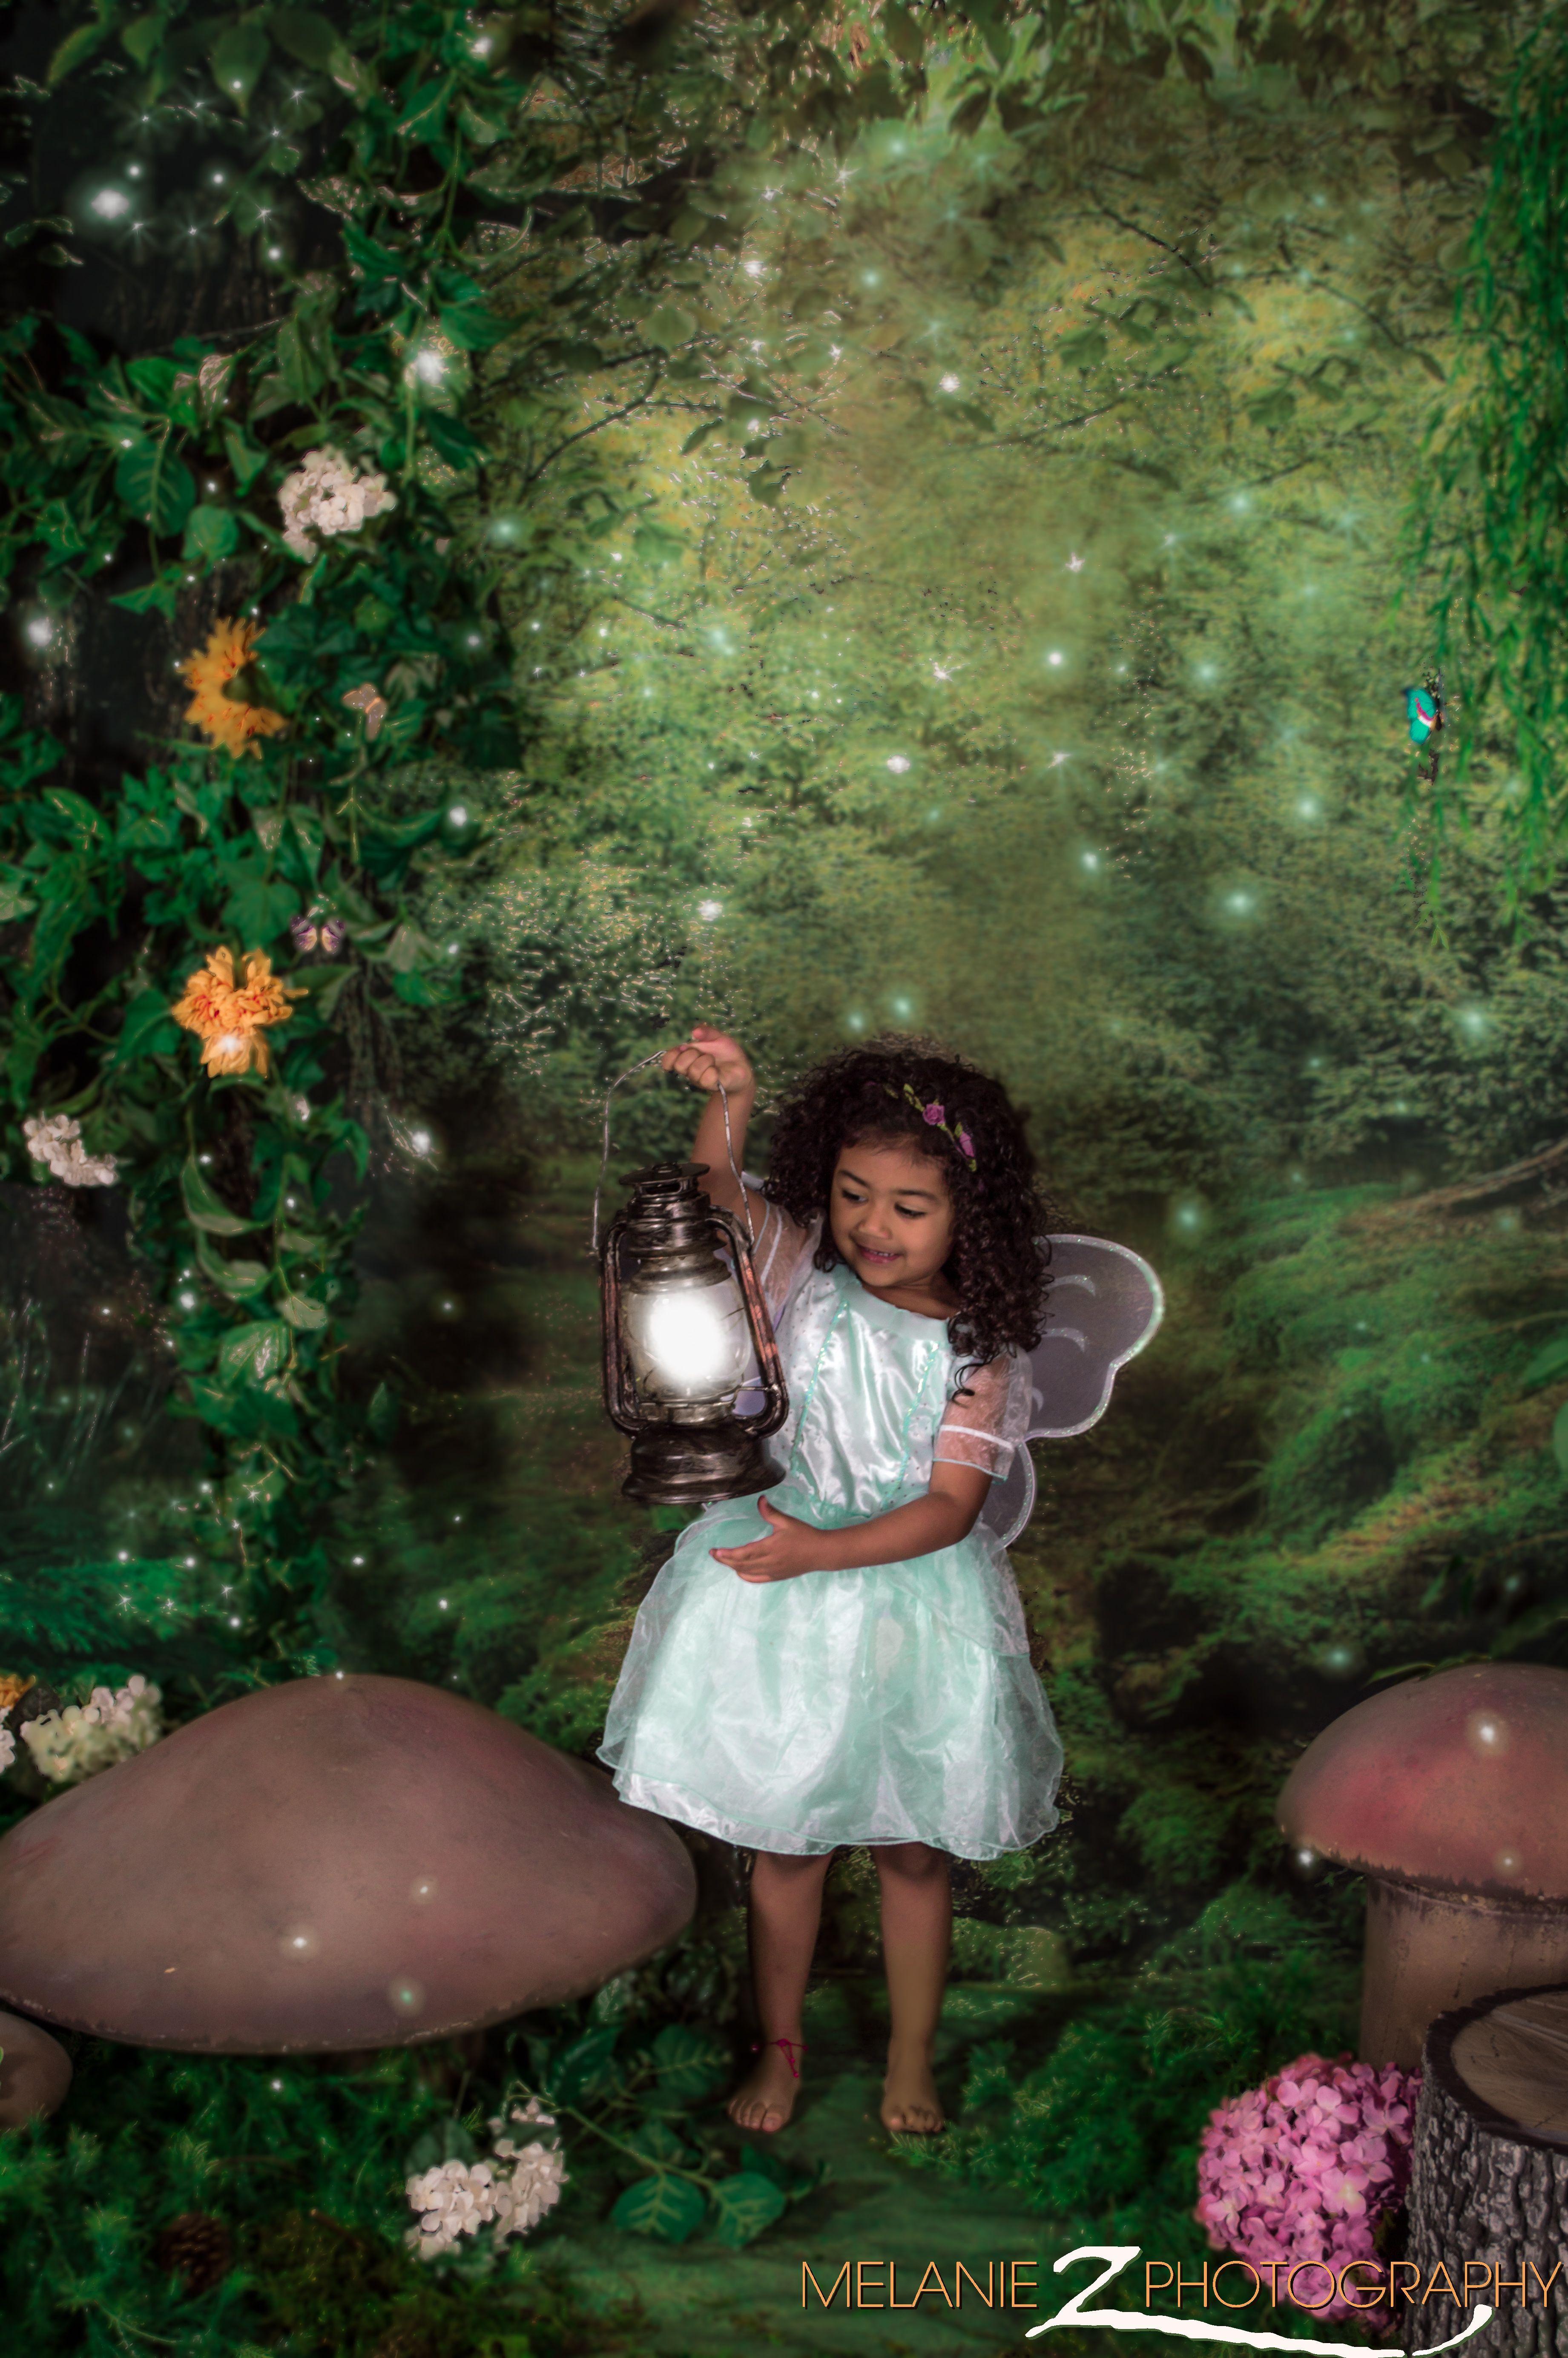 Woodland Fairies Fantasy graphy Sibling Peter Pan Lost